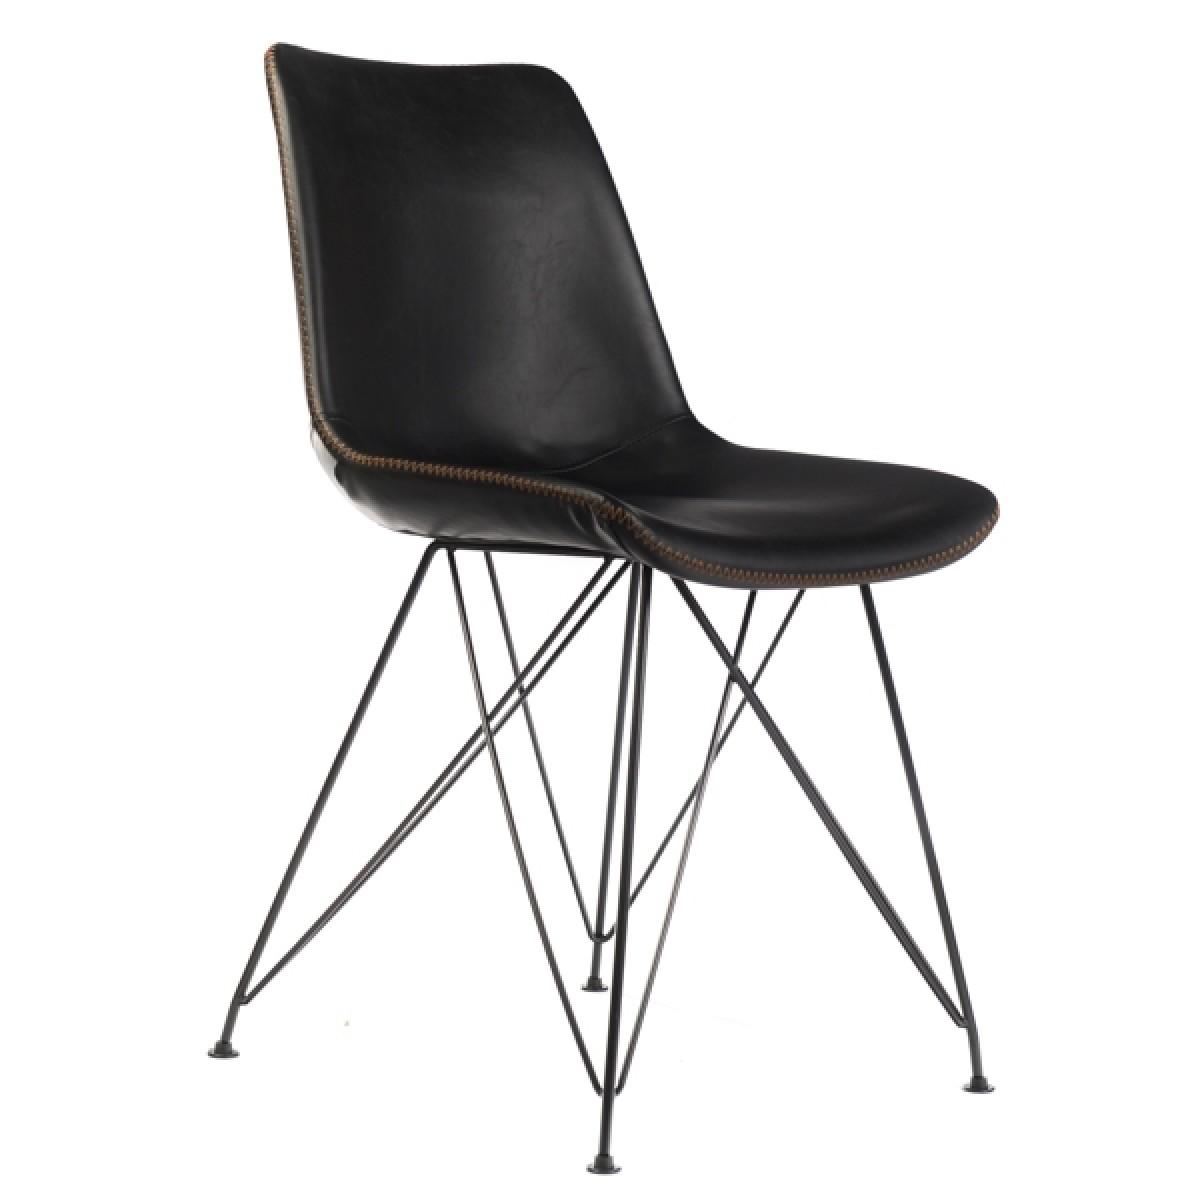 Stuhl schwarz stuhl gepolstert schwarz for Stuhl gepolstert